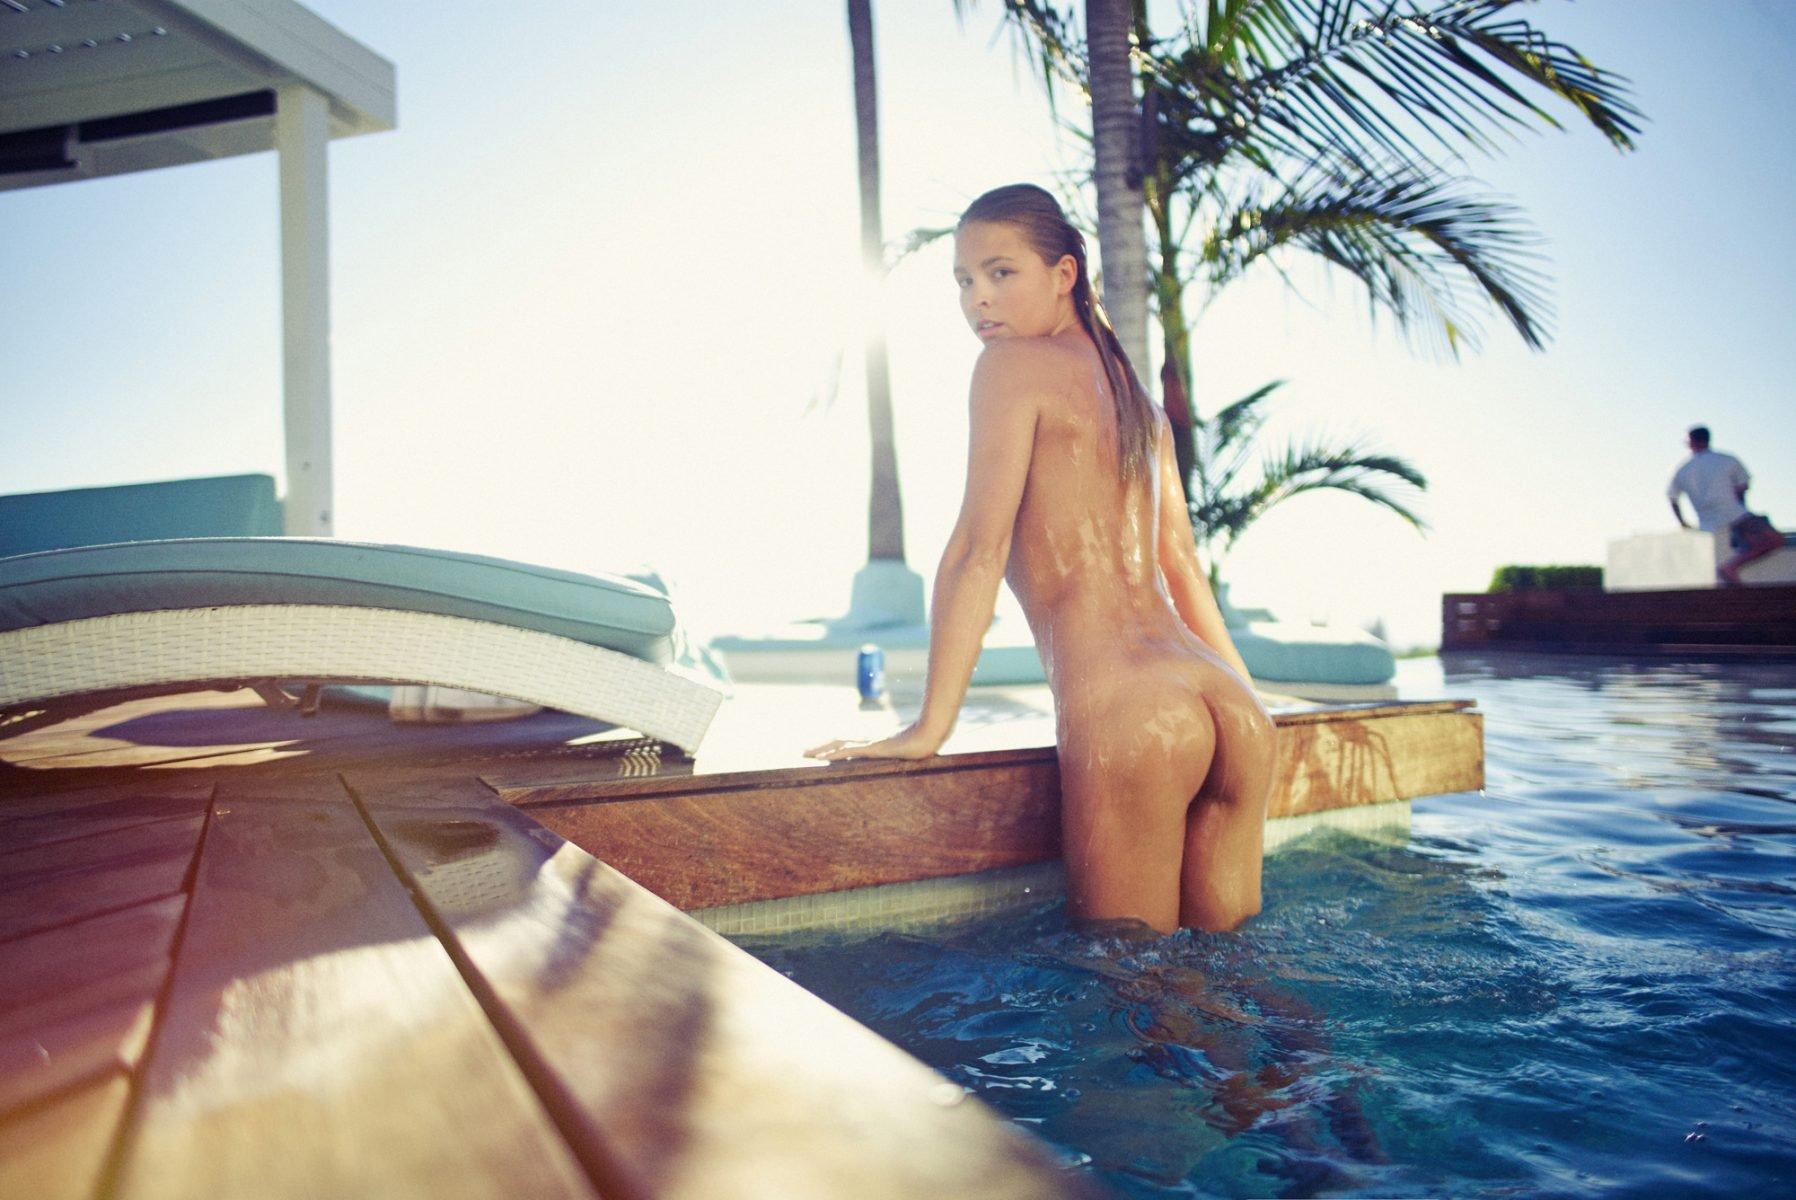 Marisa tomei nude pussy wrestler pics